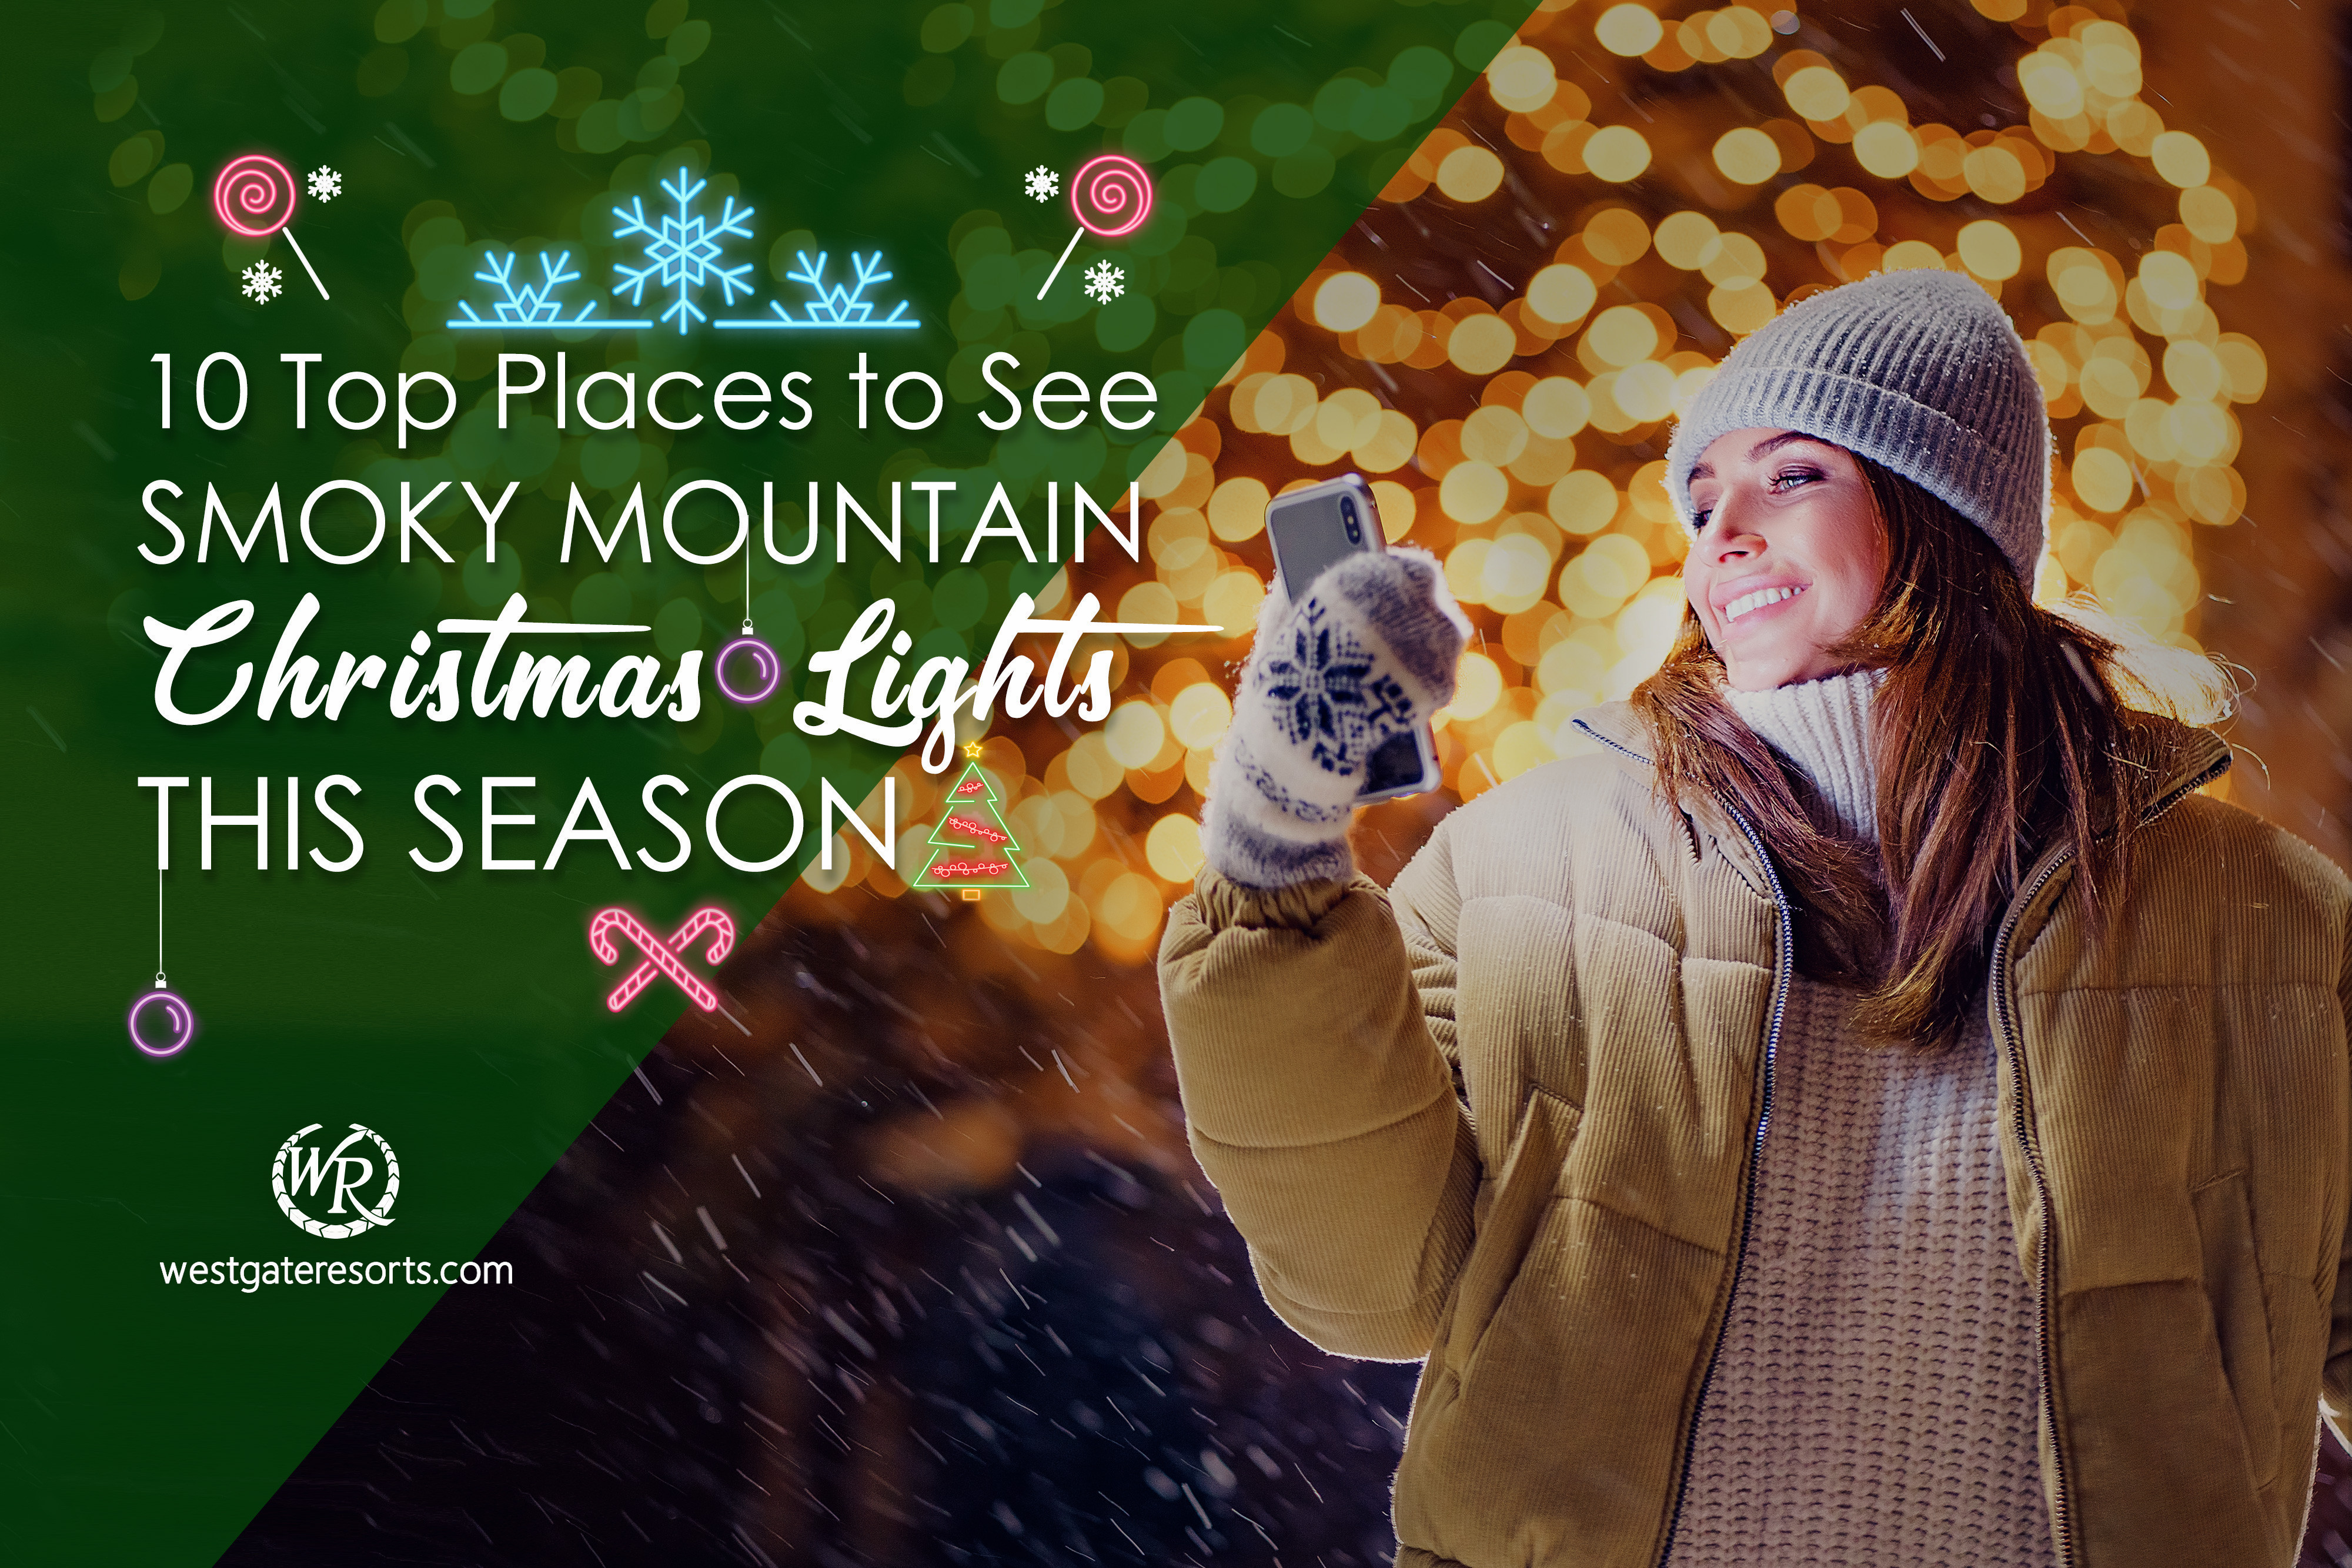 10 Top Places to See Smoky Mountain Christmas Lights This Season